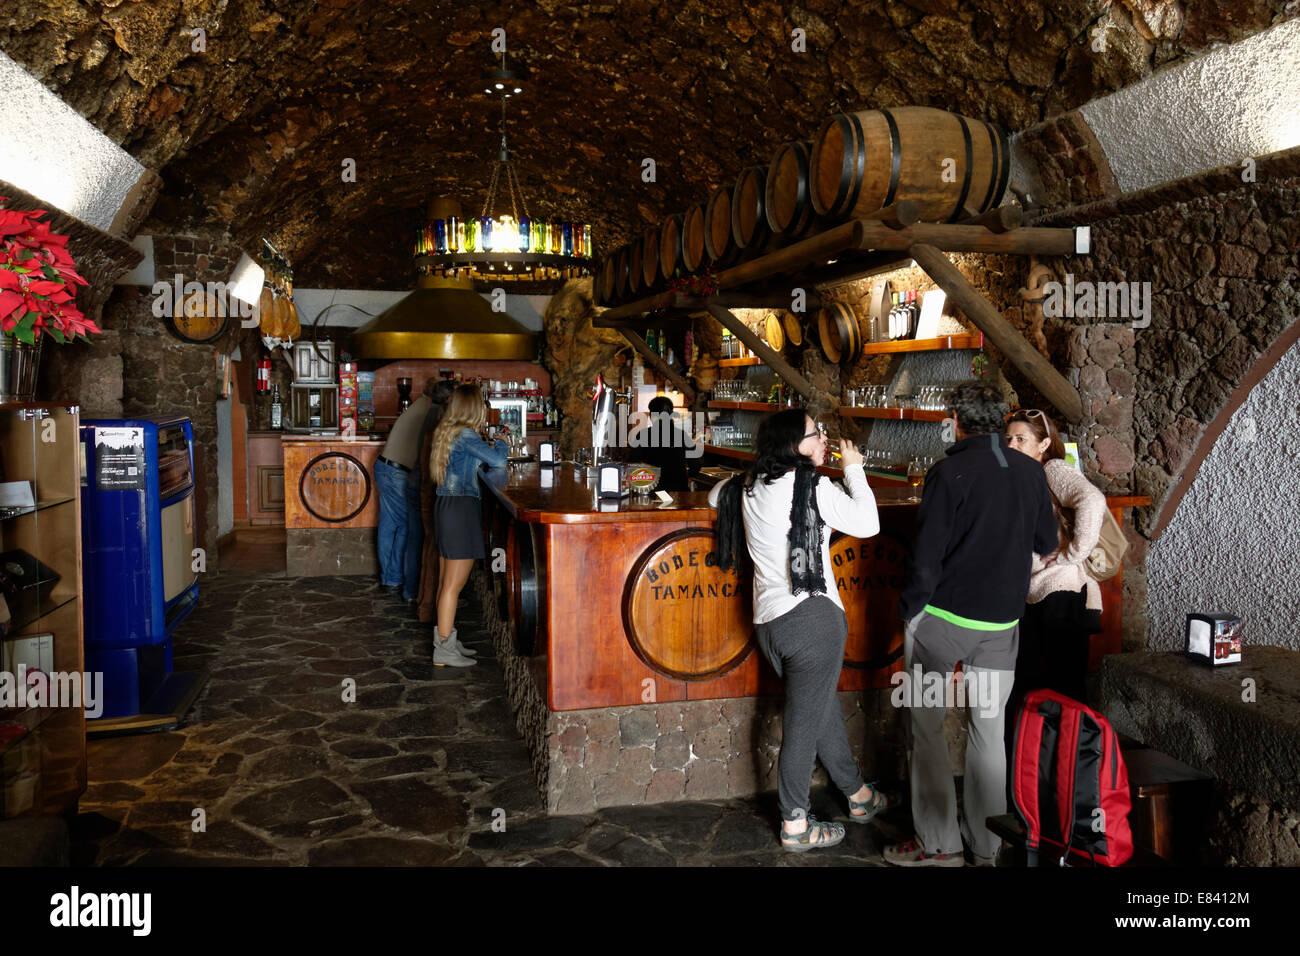 Bodegas Tamanca bar, San Nicolás, La Palma, Canary Islands, Spain - Stock Image